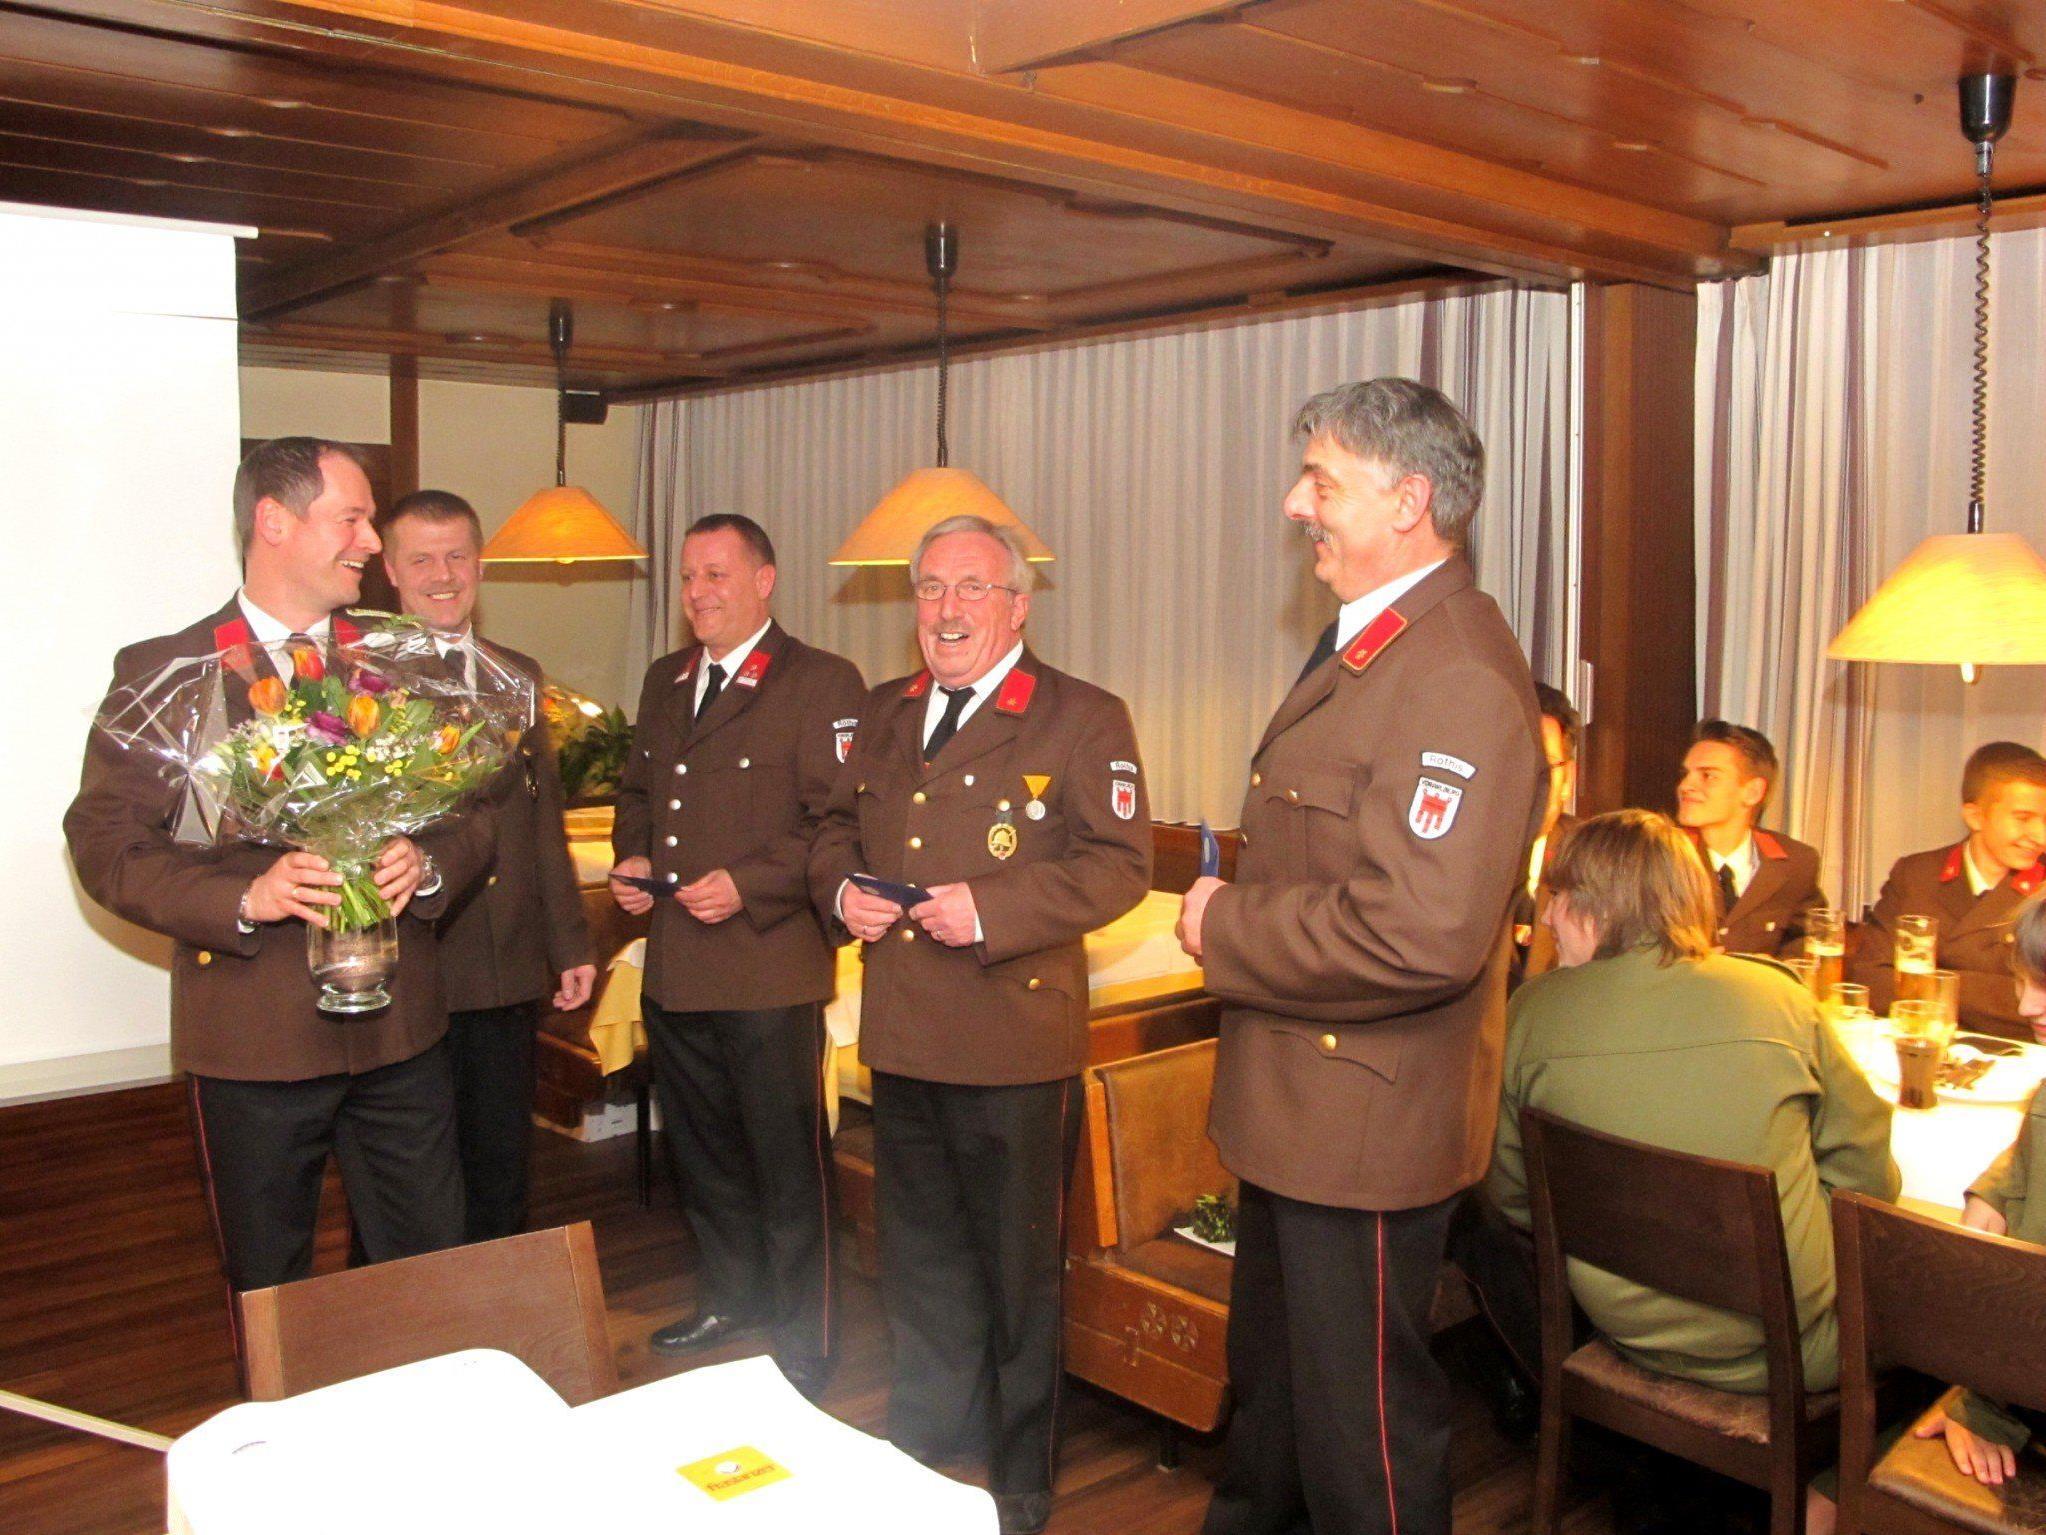 Drei langjährige Funktionäre wurden von Kommandant Joachim Ellensohn verabschiedet.